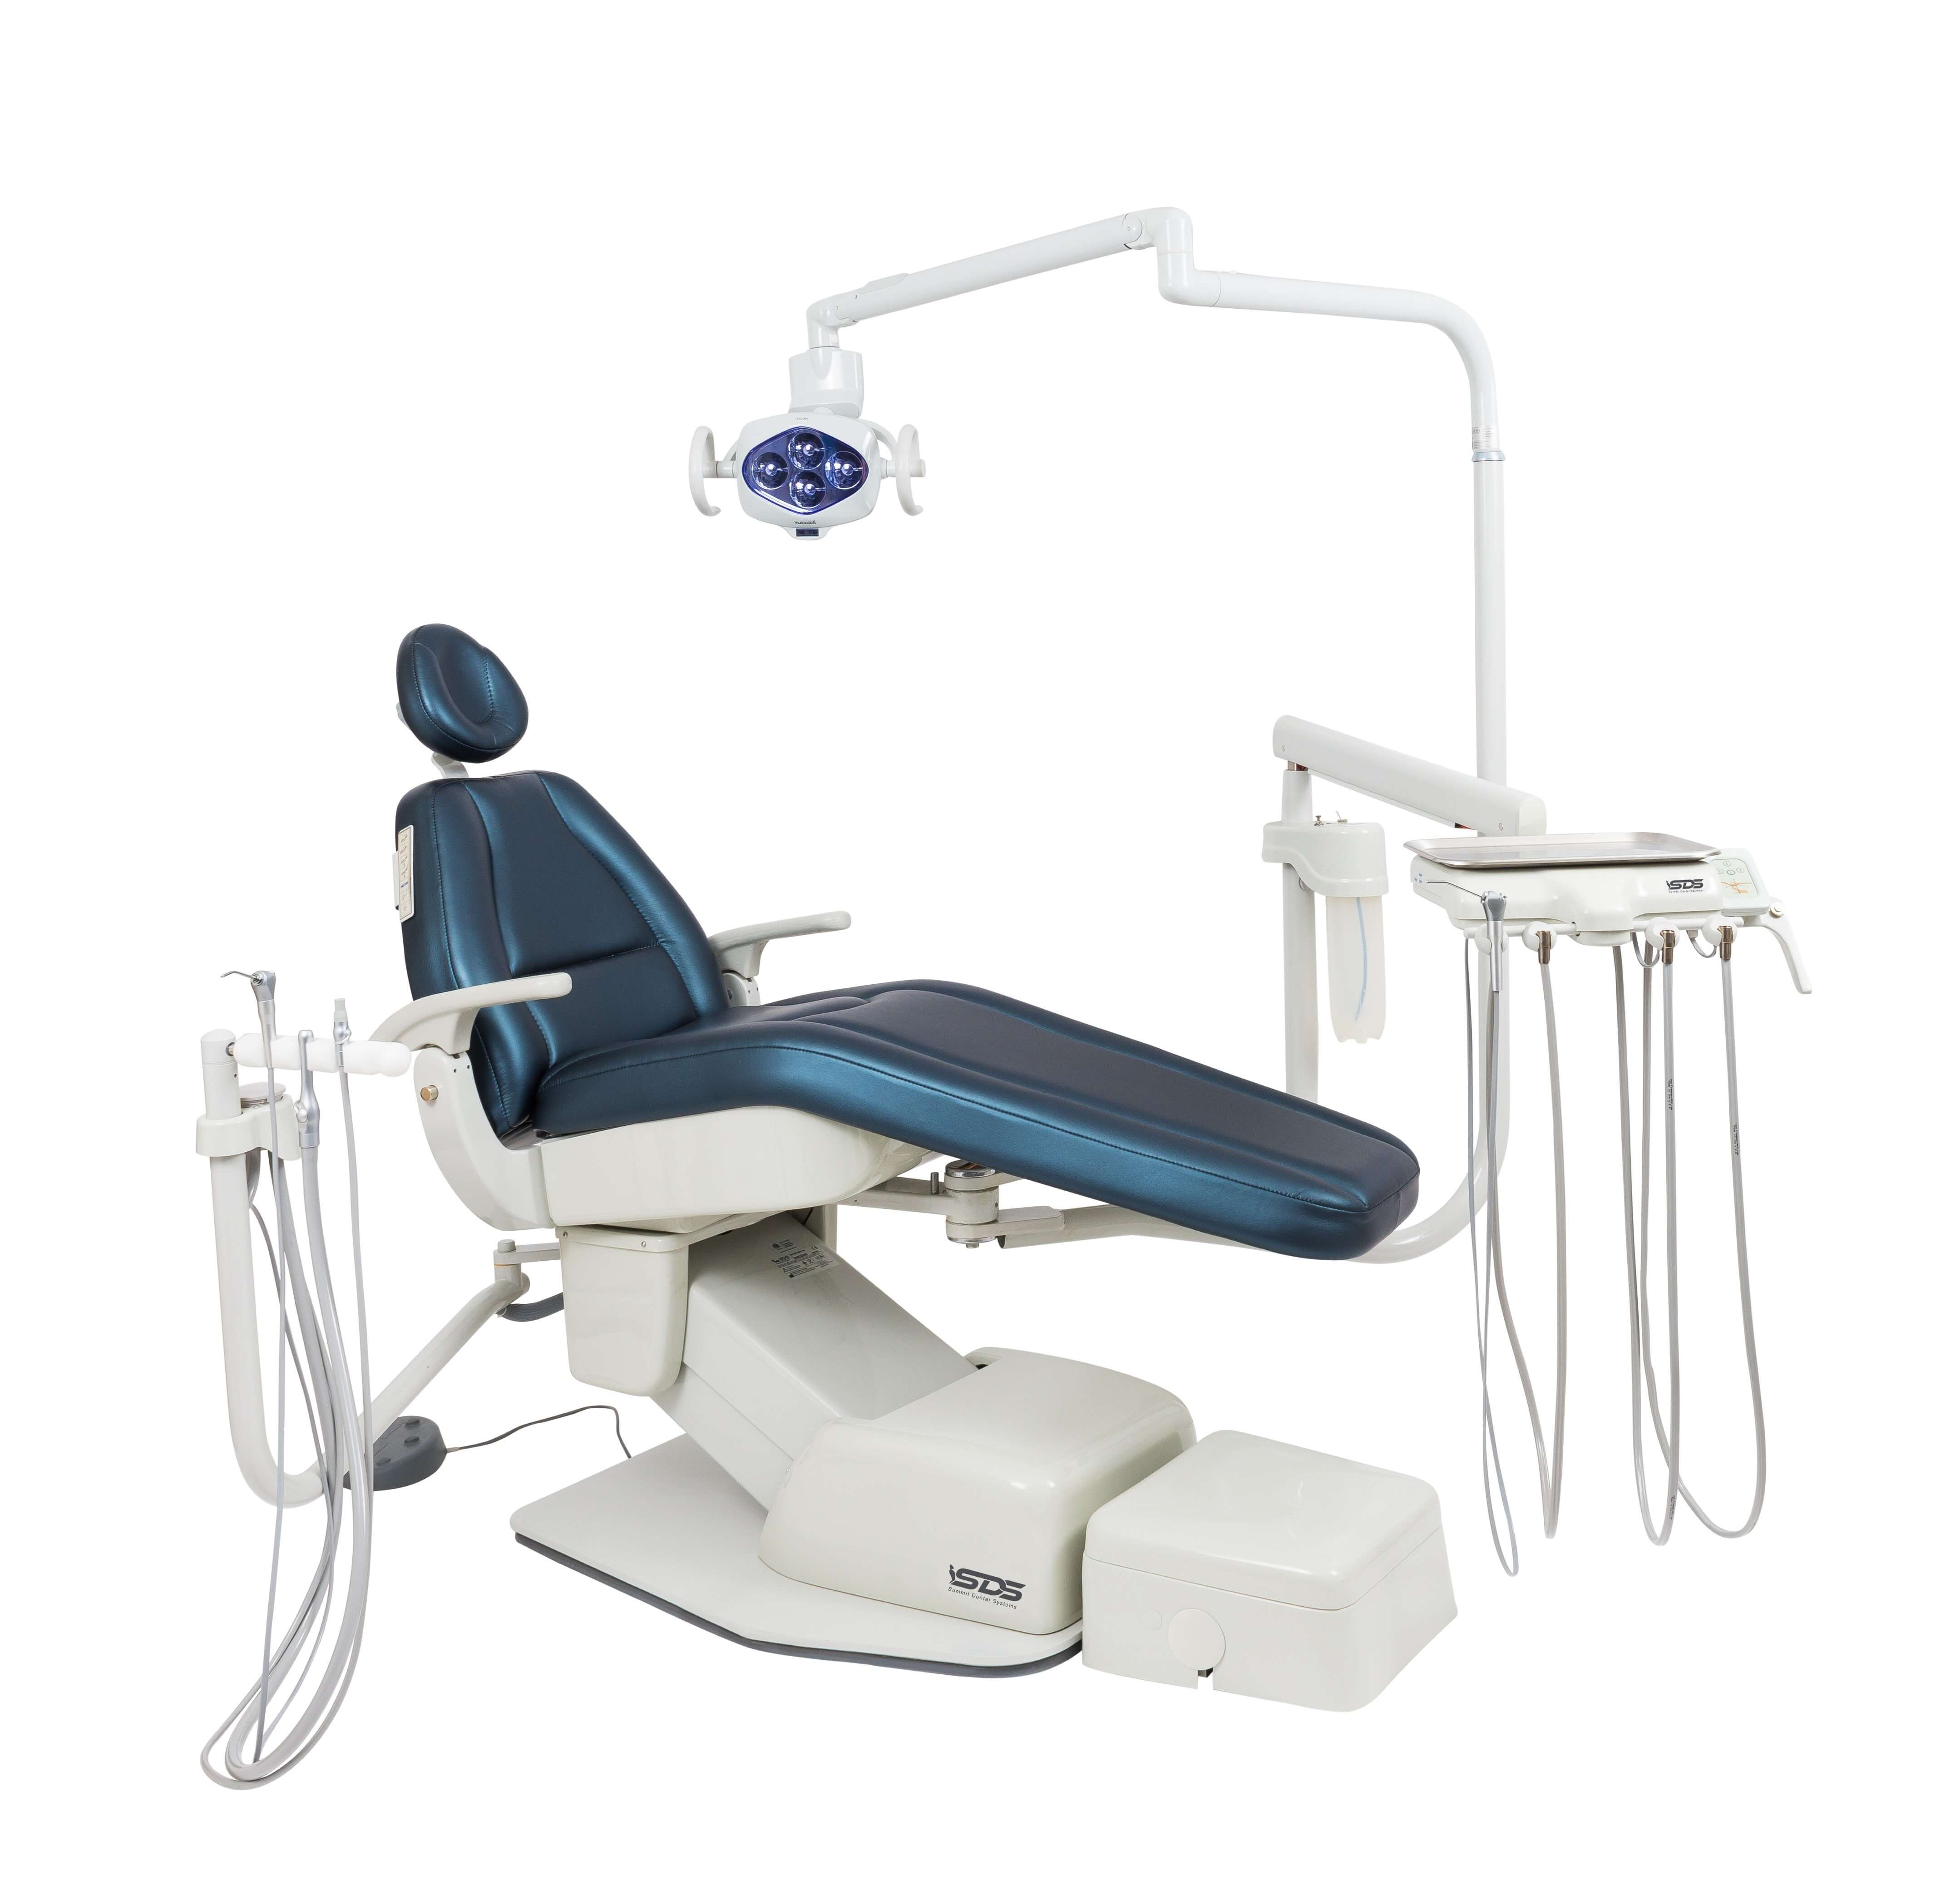 Summit Dental Systems Dental Equipment Priced Just Right